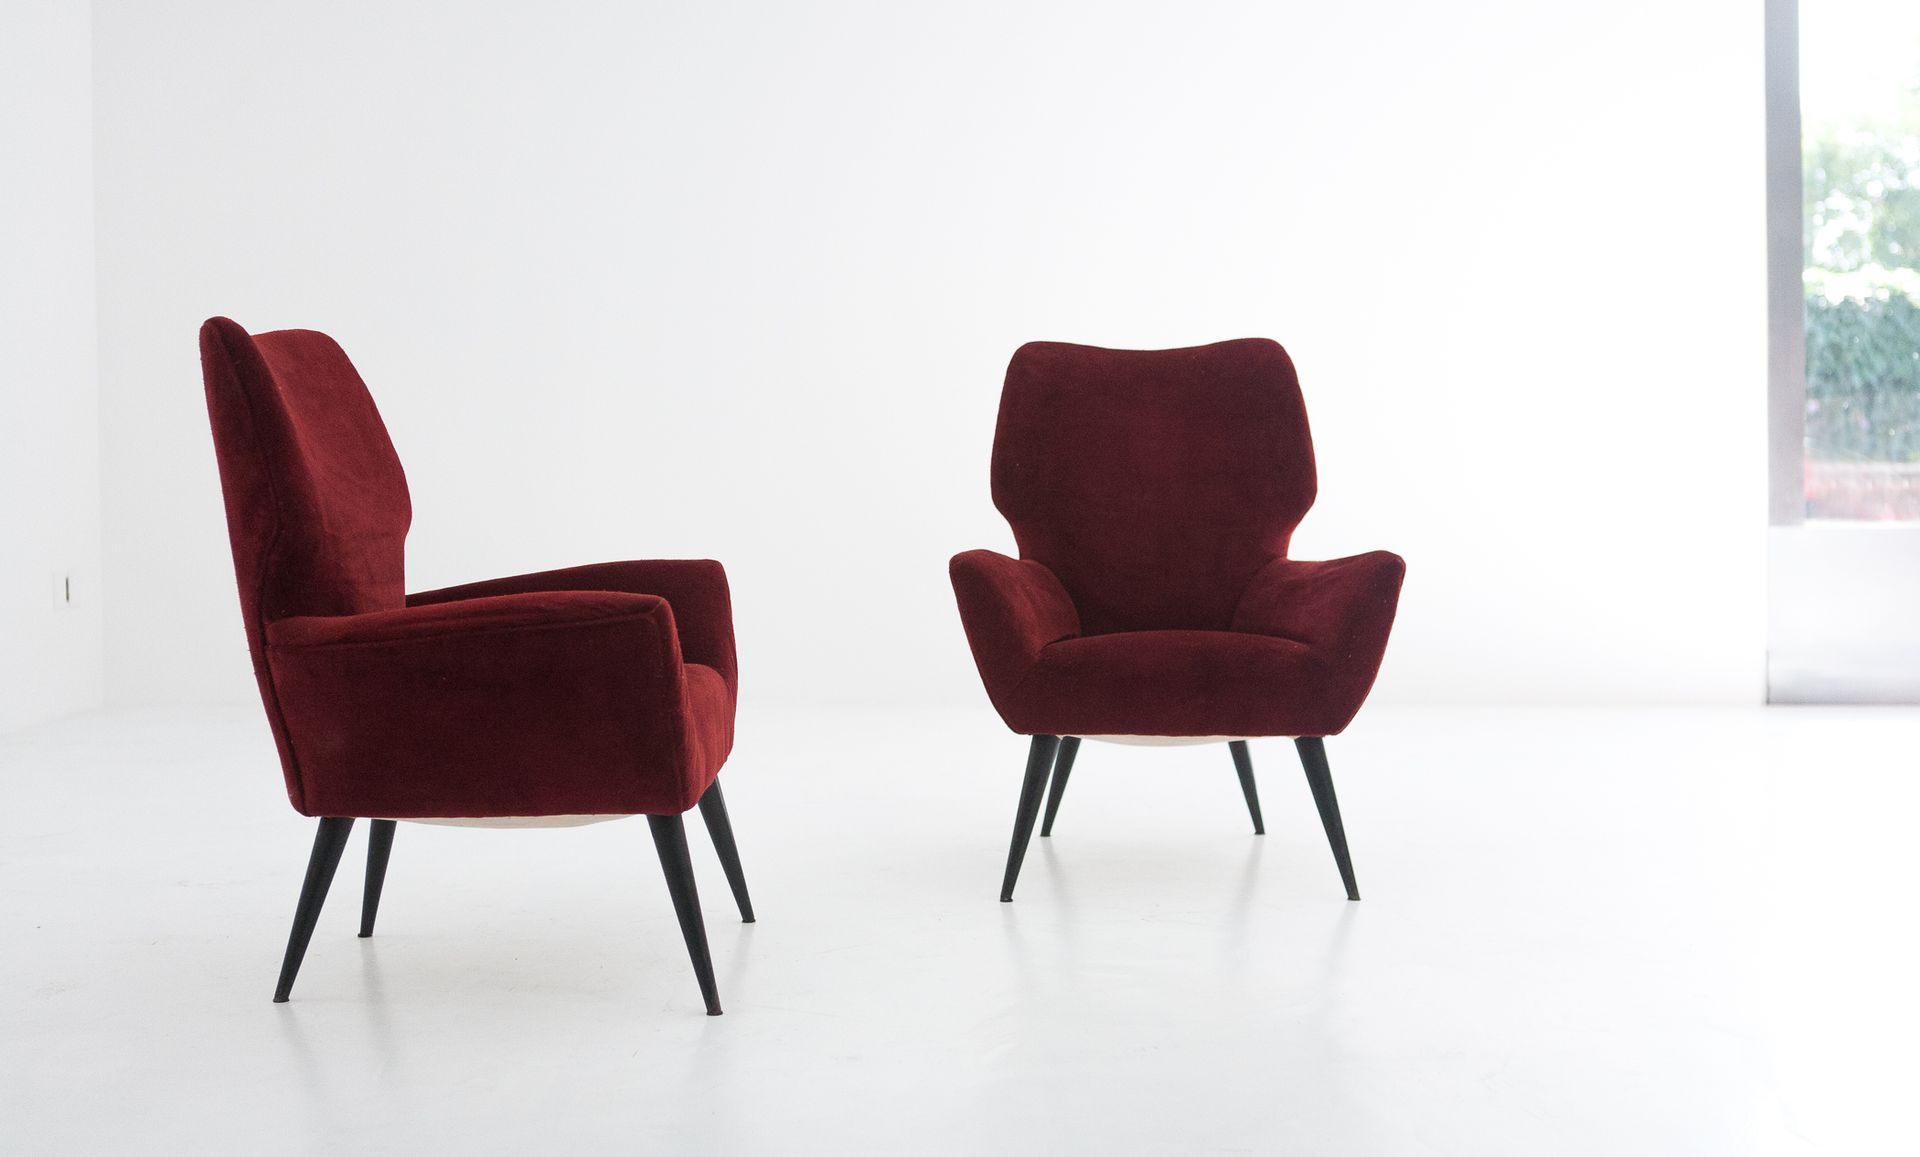 rote italienische samt sessel 1950er 2er set bei pamono kaufen. Black Bedroom Furniture Sets. Home Design Ideas